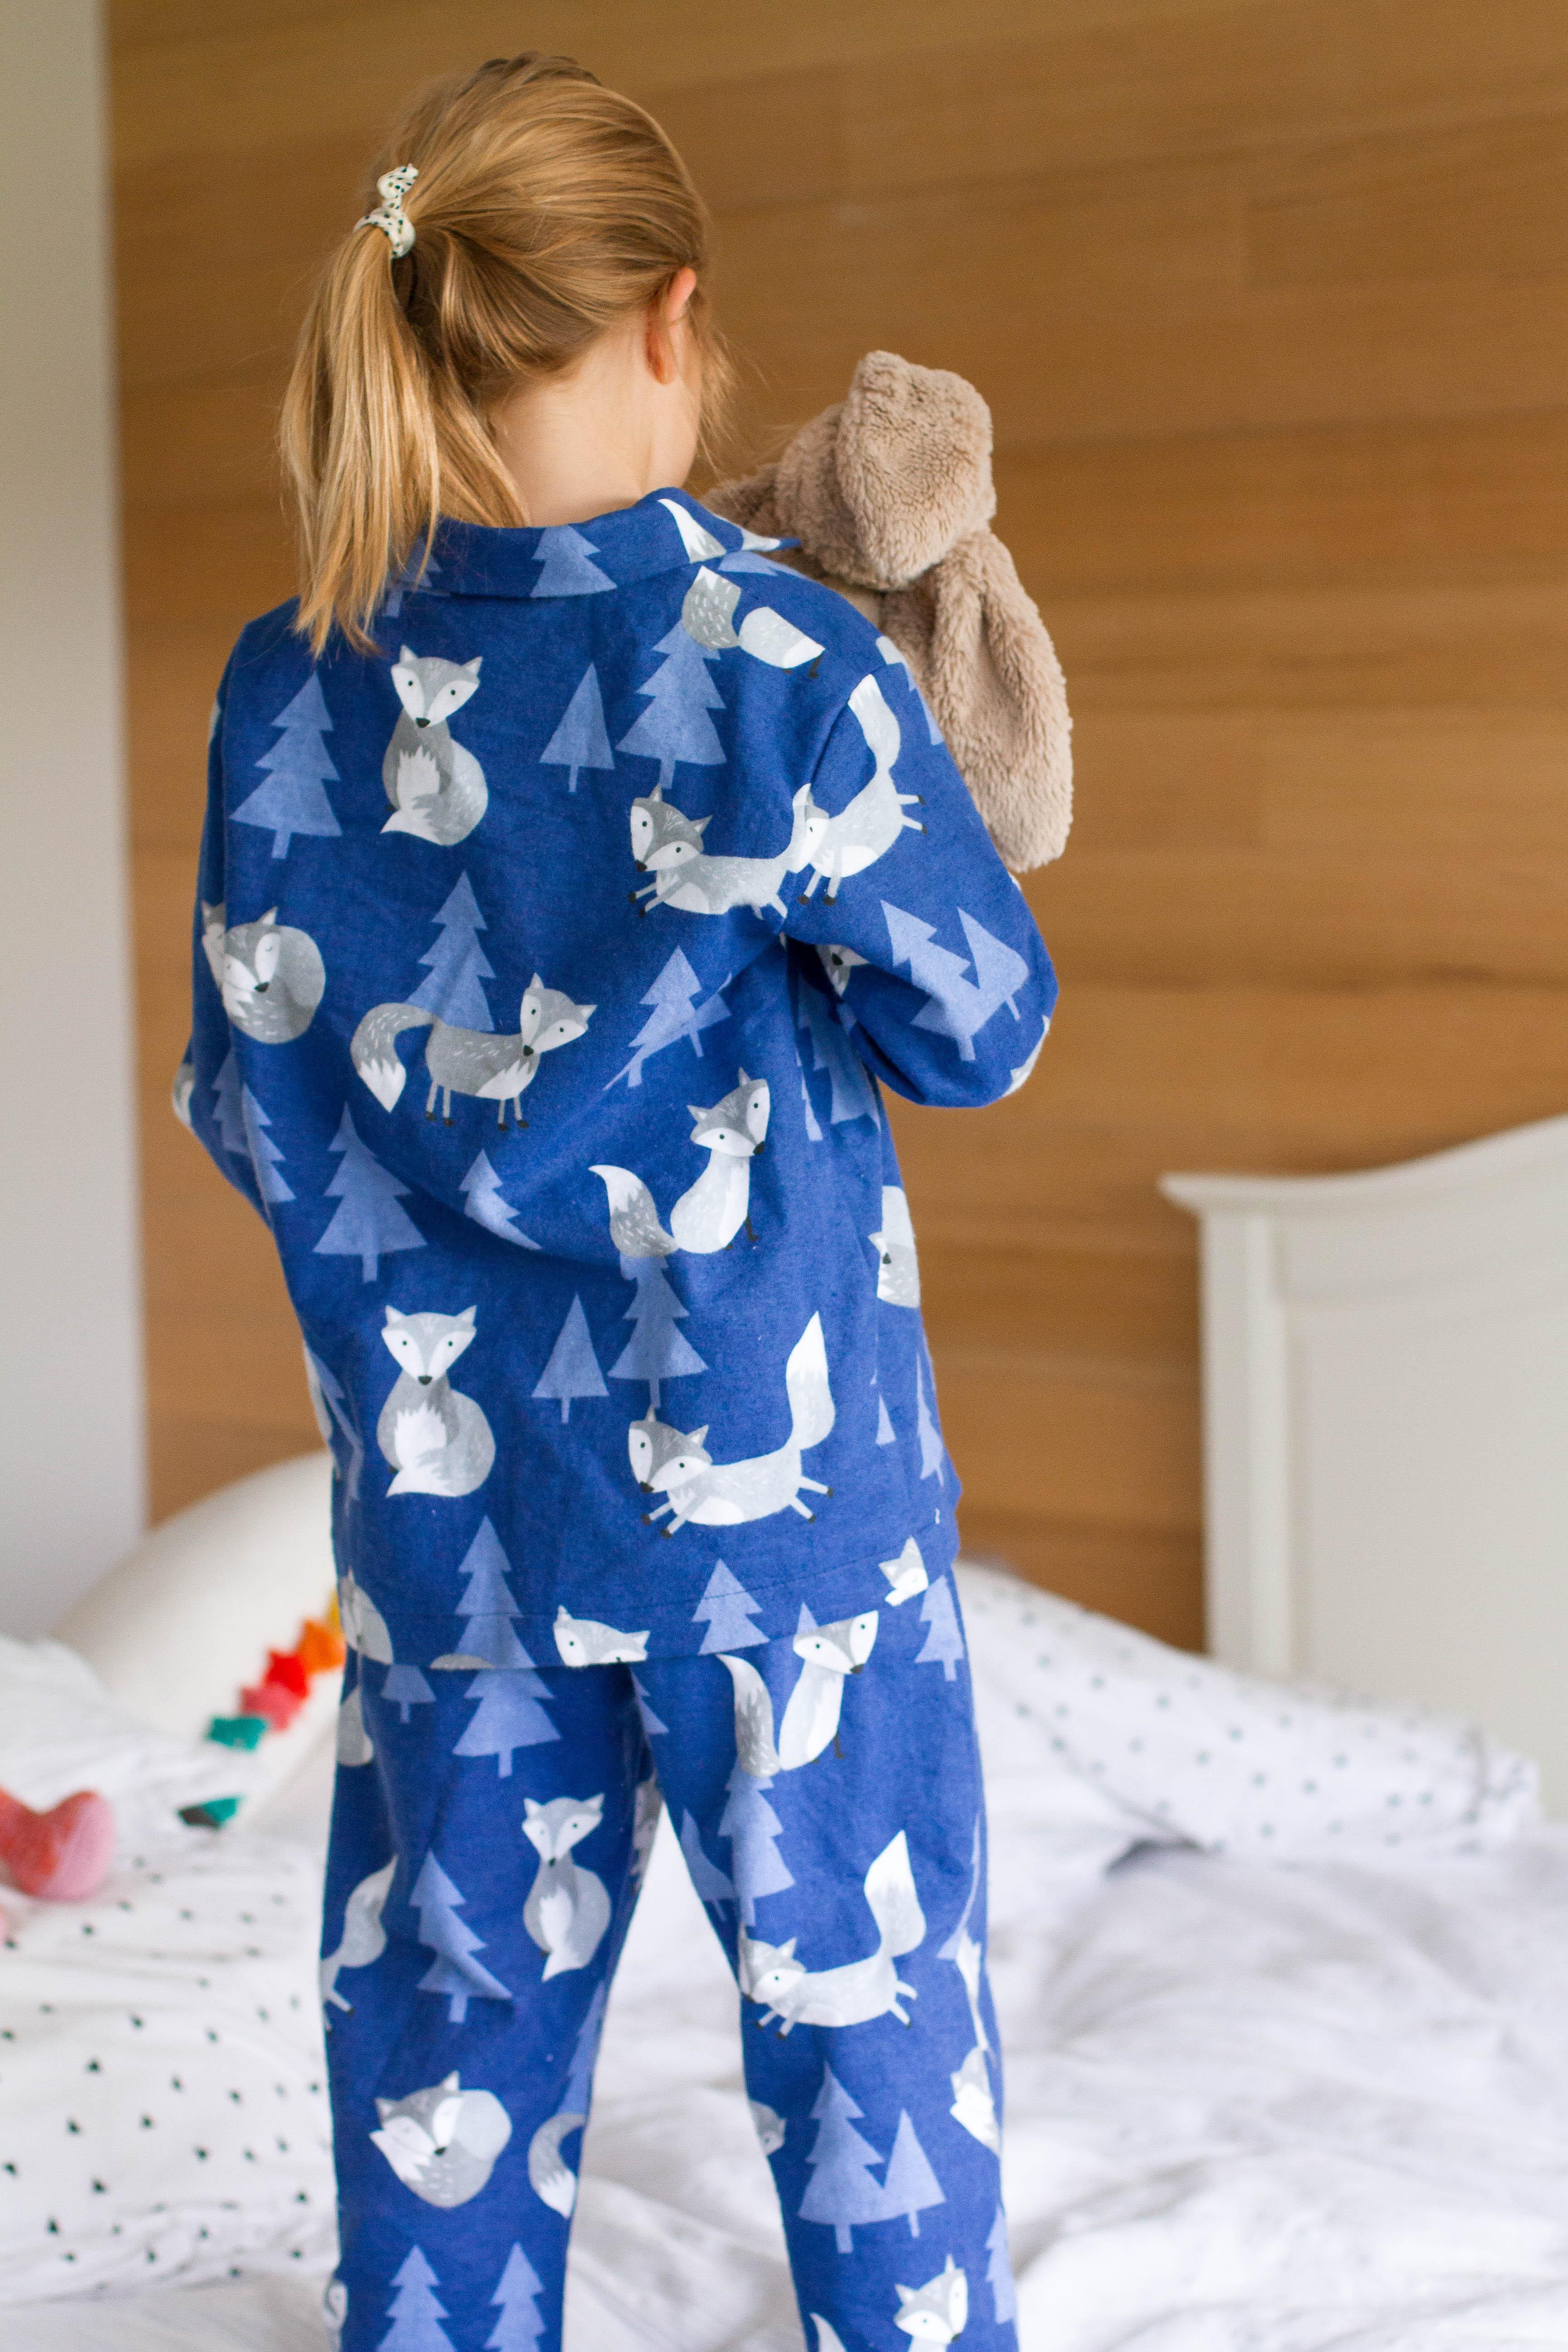 Catnap Pyjamas Make It Perfect